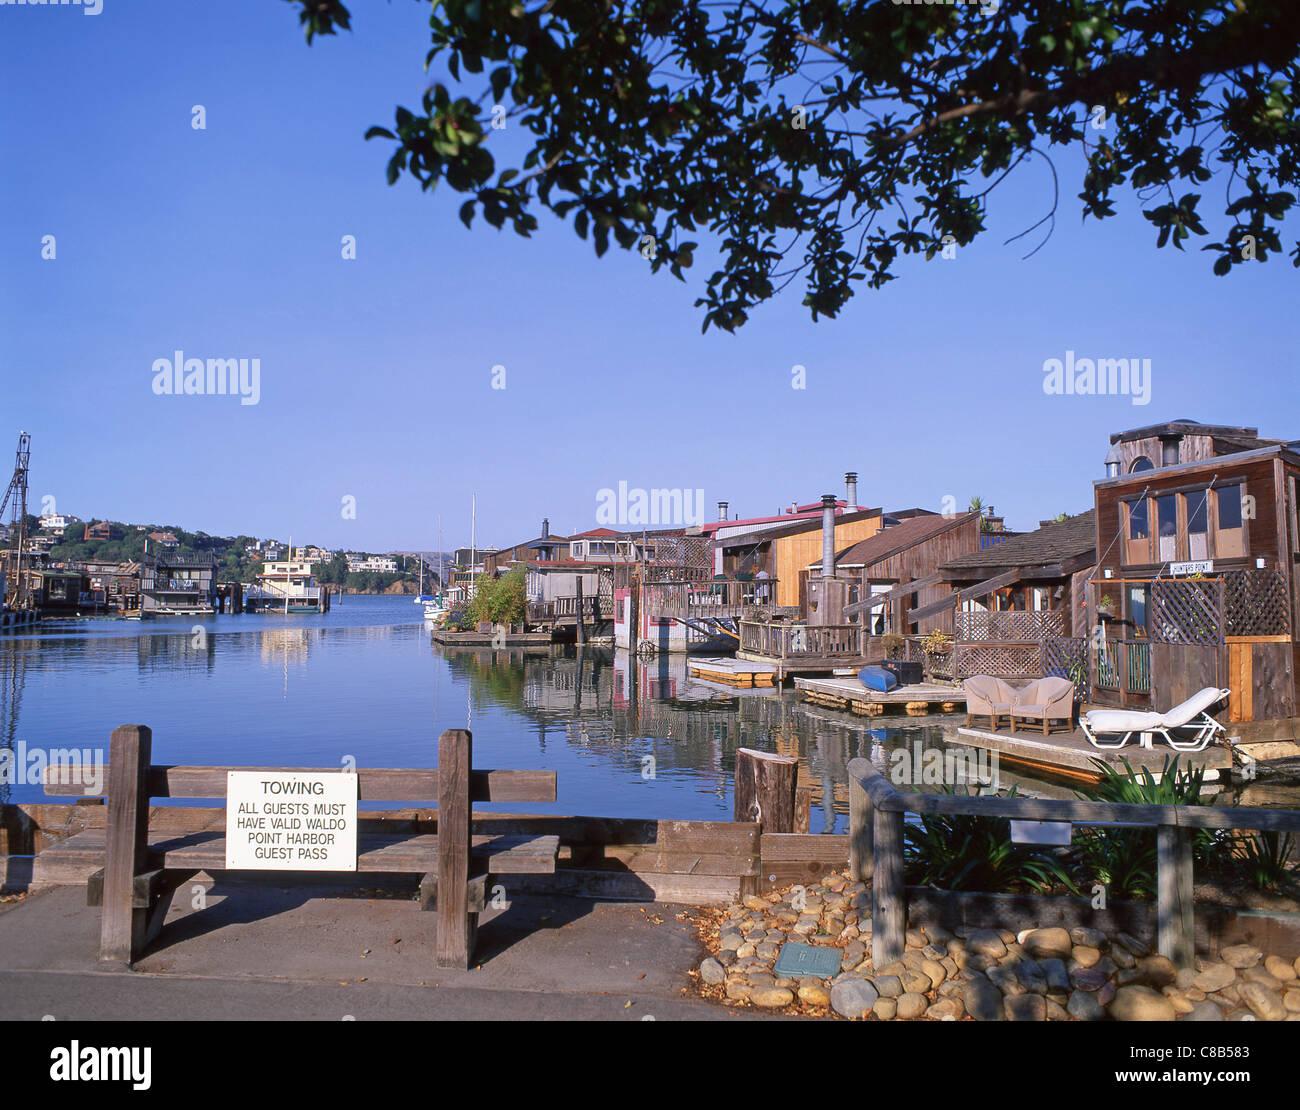 Apartments In San Francisco Bay Area: Sausalito Houseboats, Waldo Point Harbor, Sausalito, San